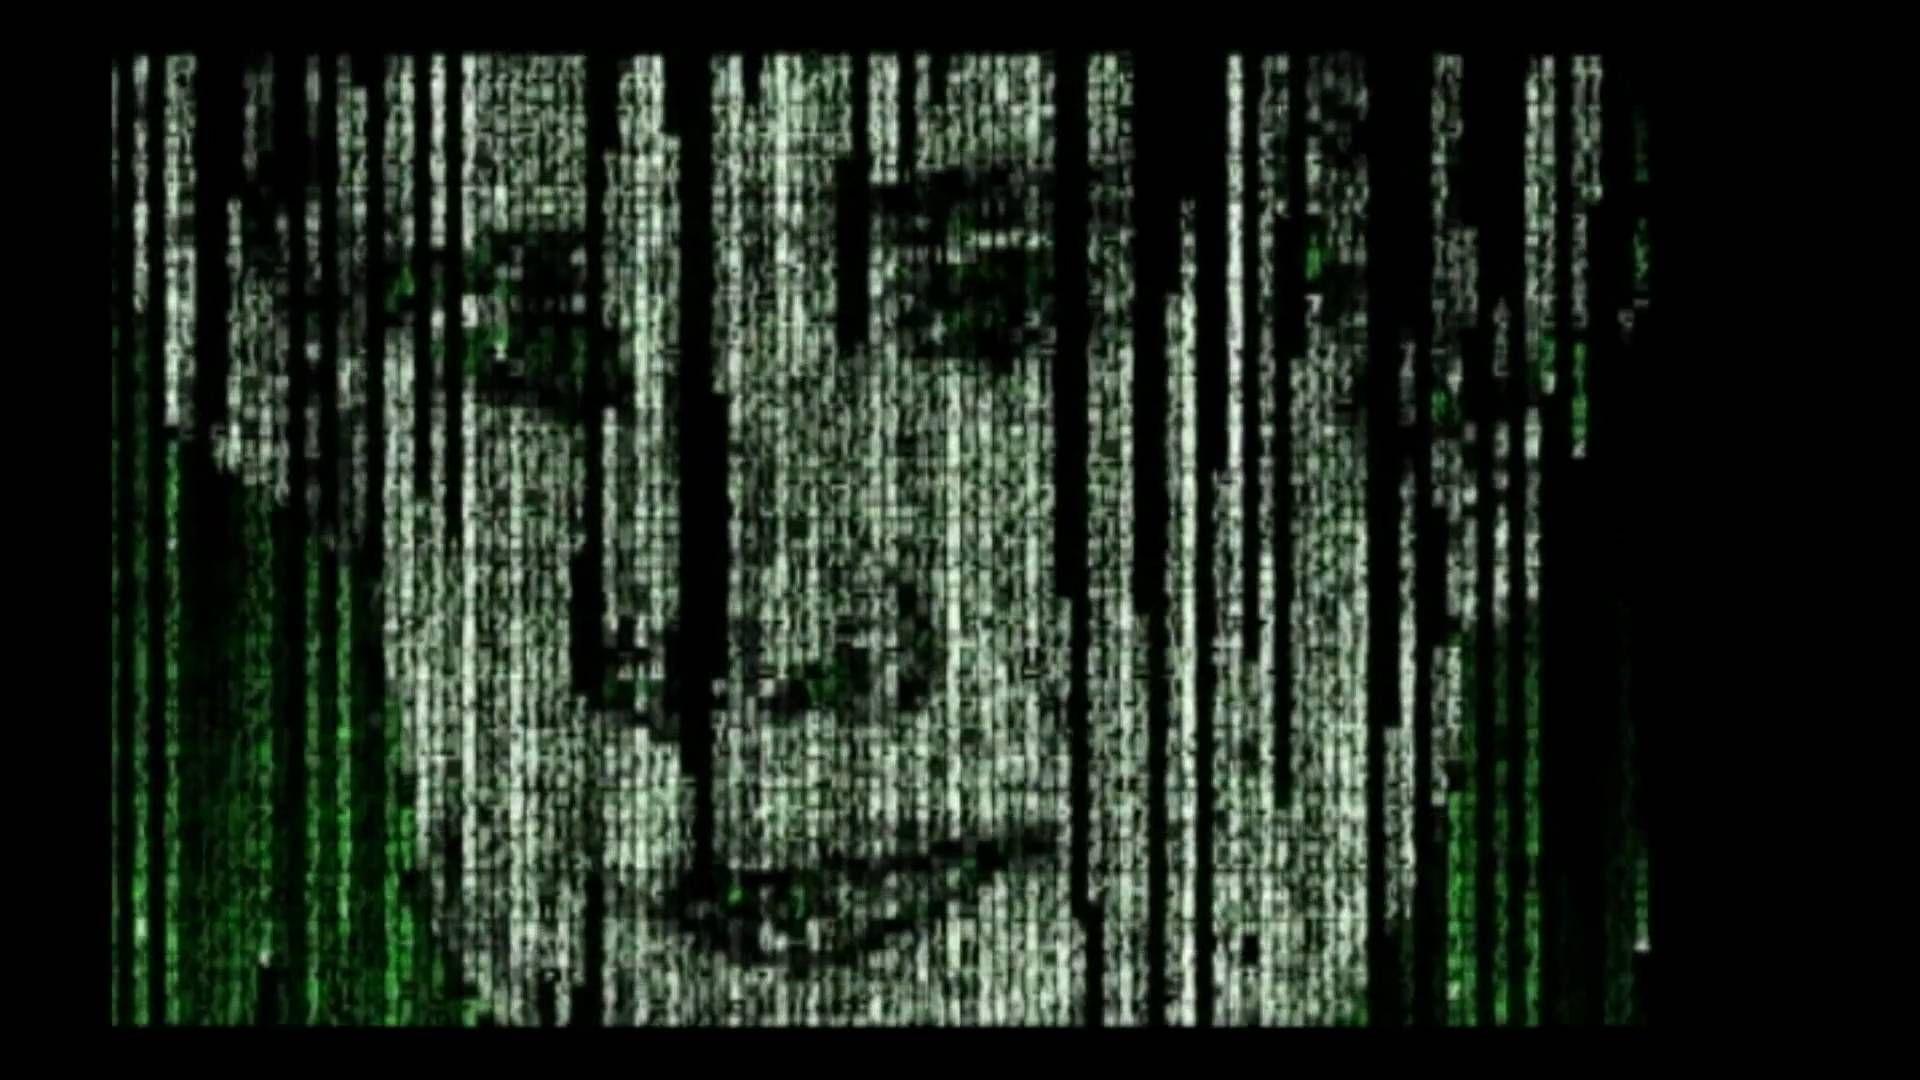 Matrix Rain Intro Effect Animation Code Digital C++ Part 1